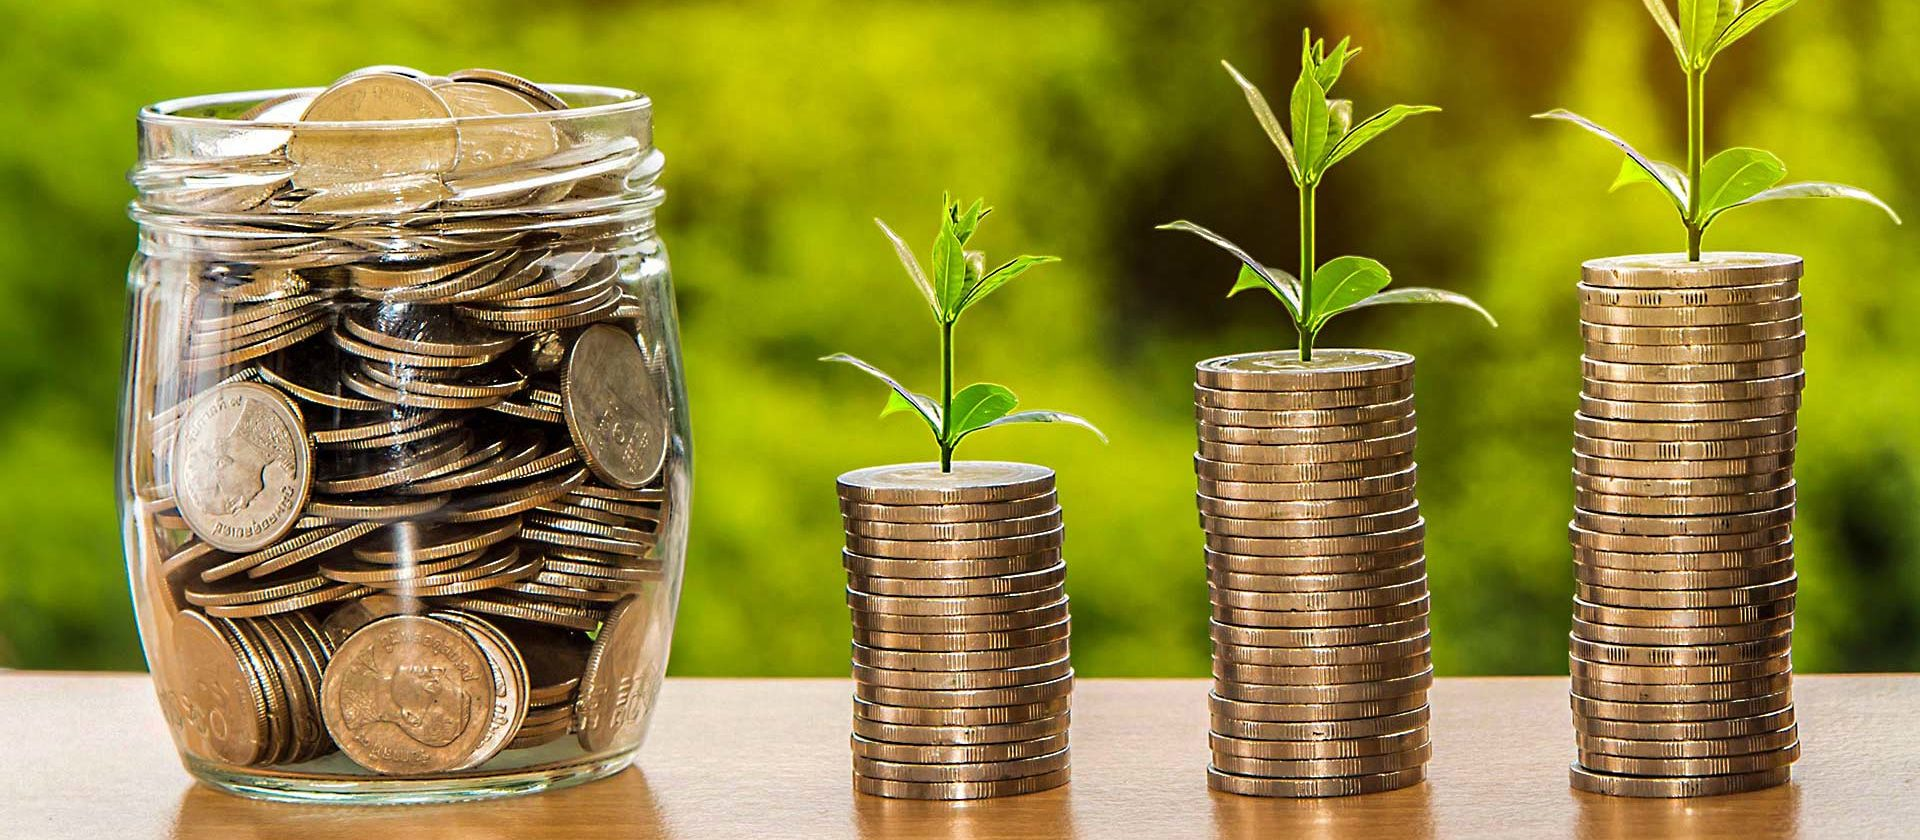 Money Grow -Image for specific Seminars